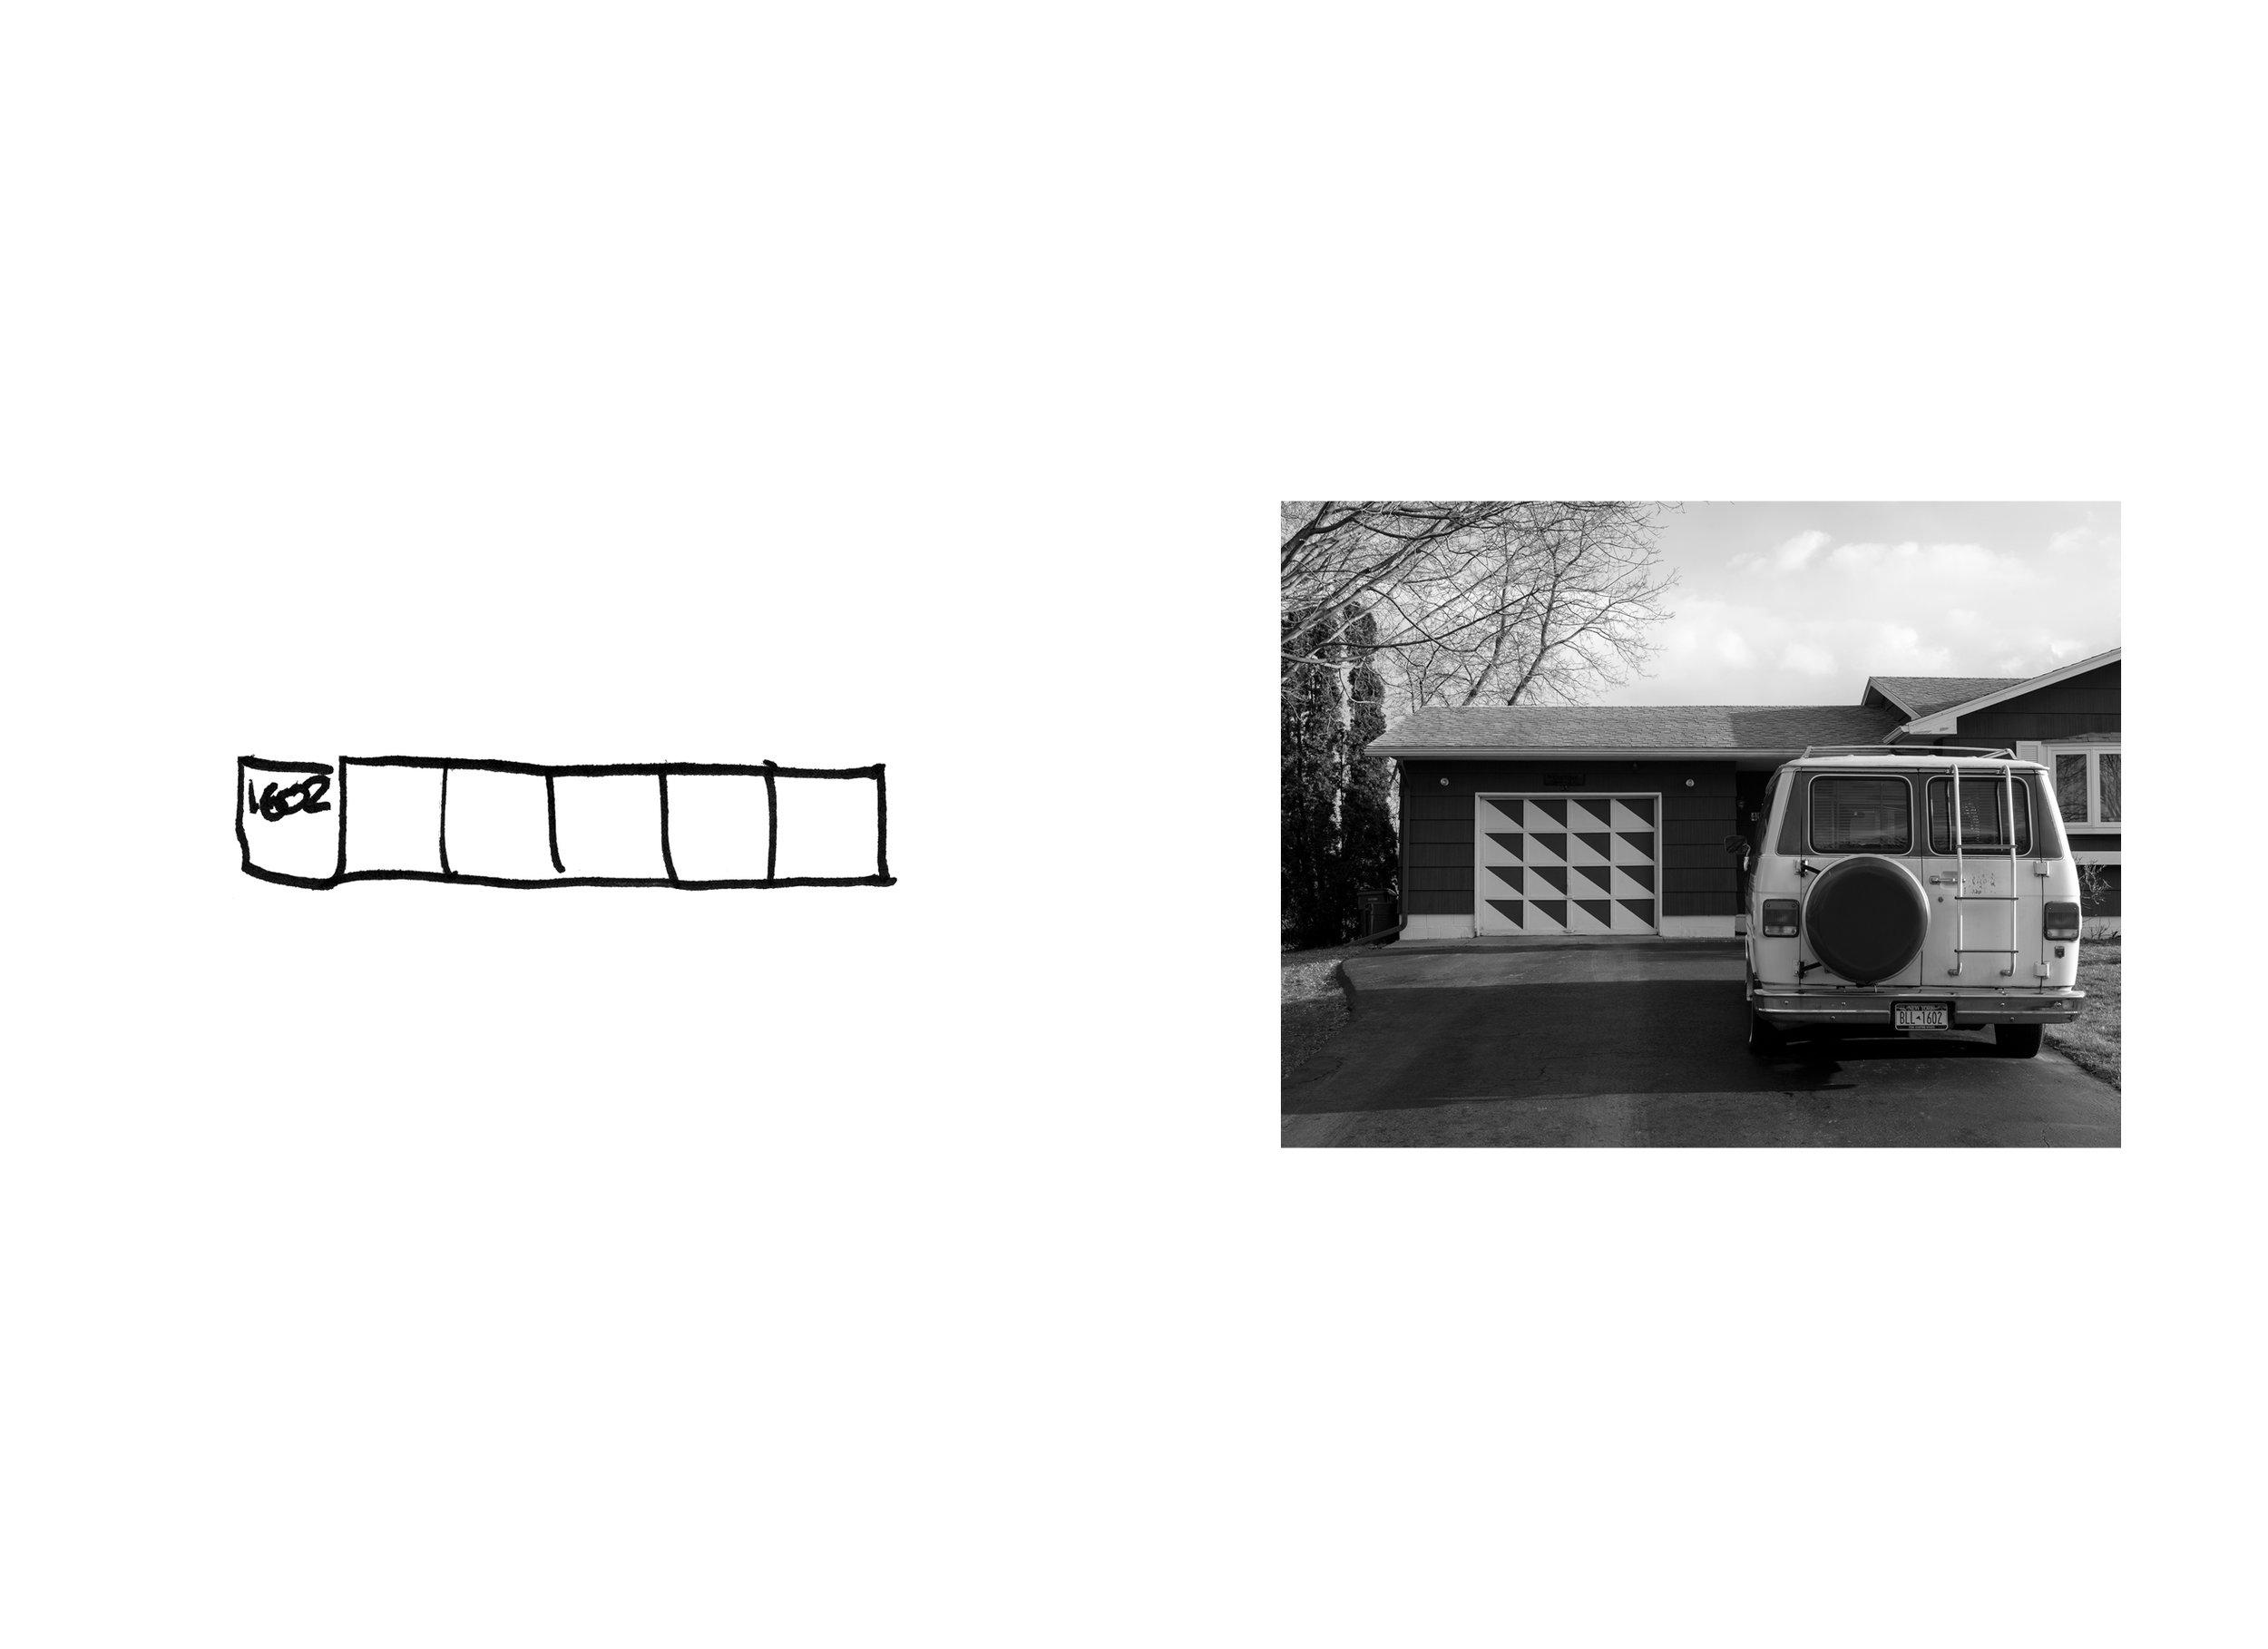 maloney_puzzles_websitie13.jpg